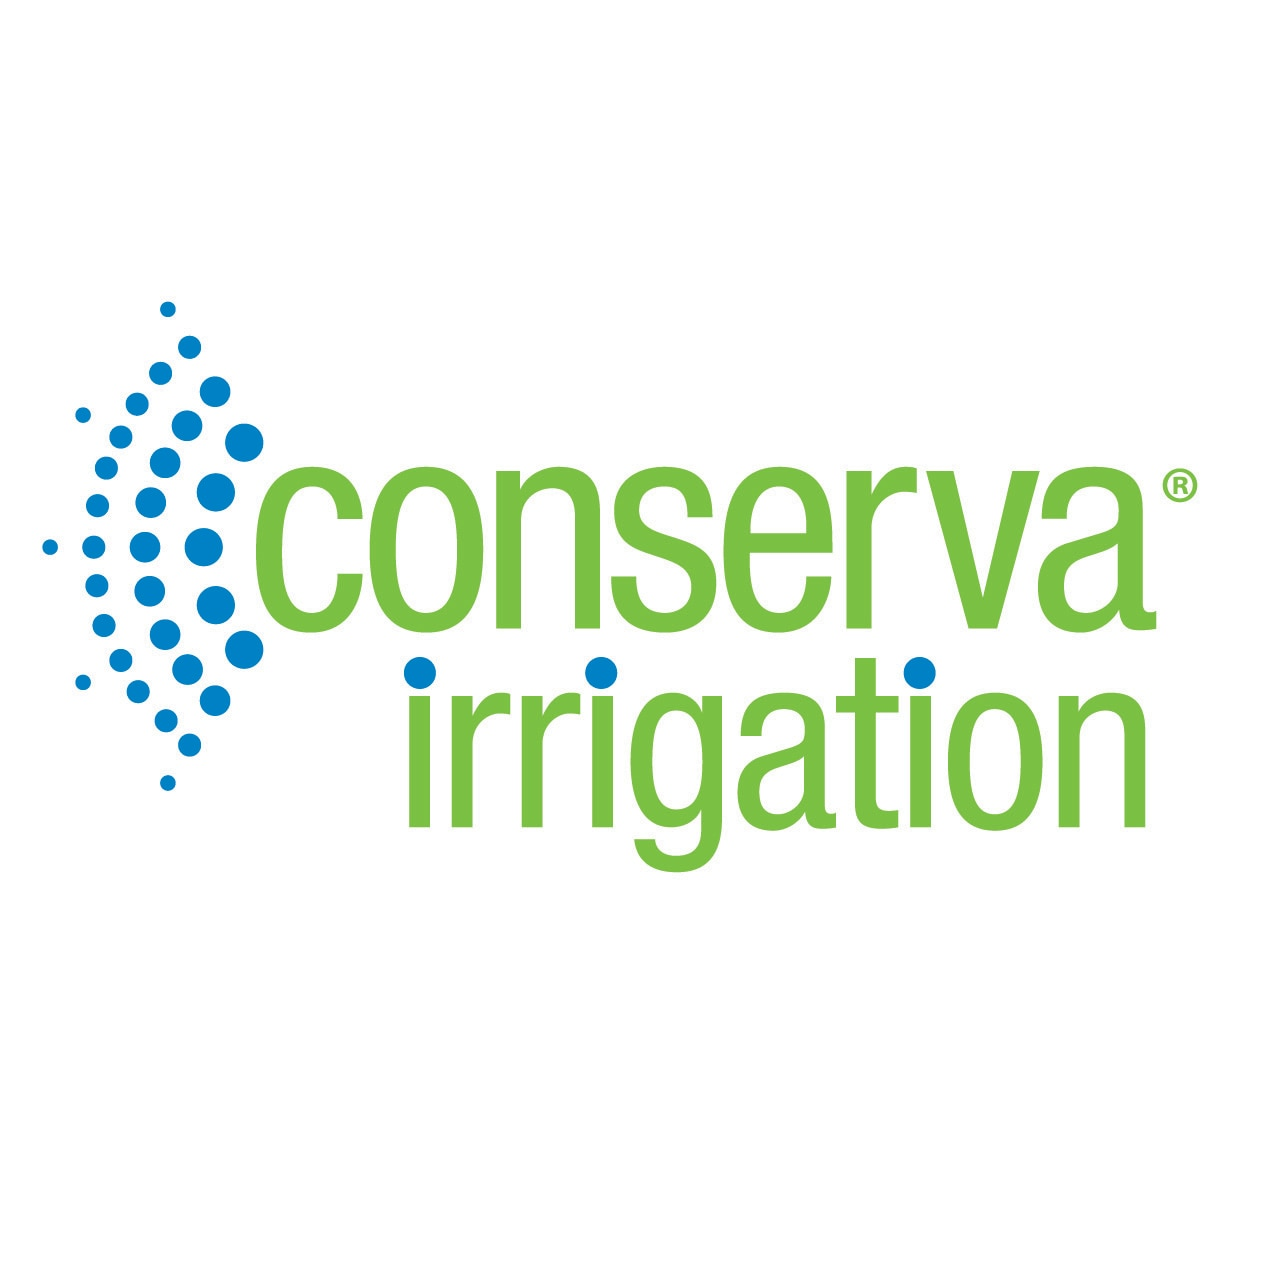 Conserva Irrigation of Fort Collins logo